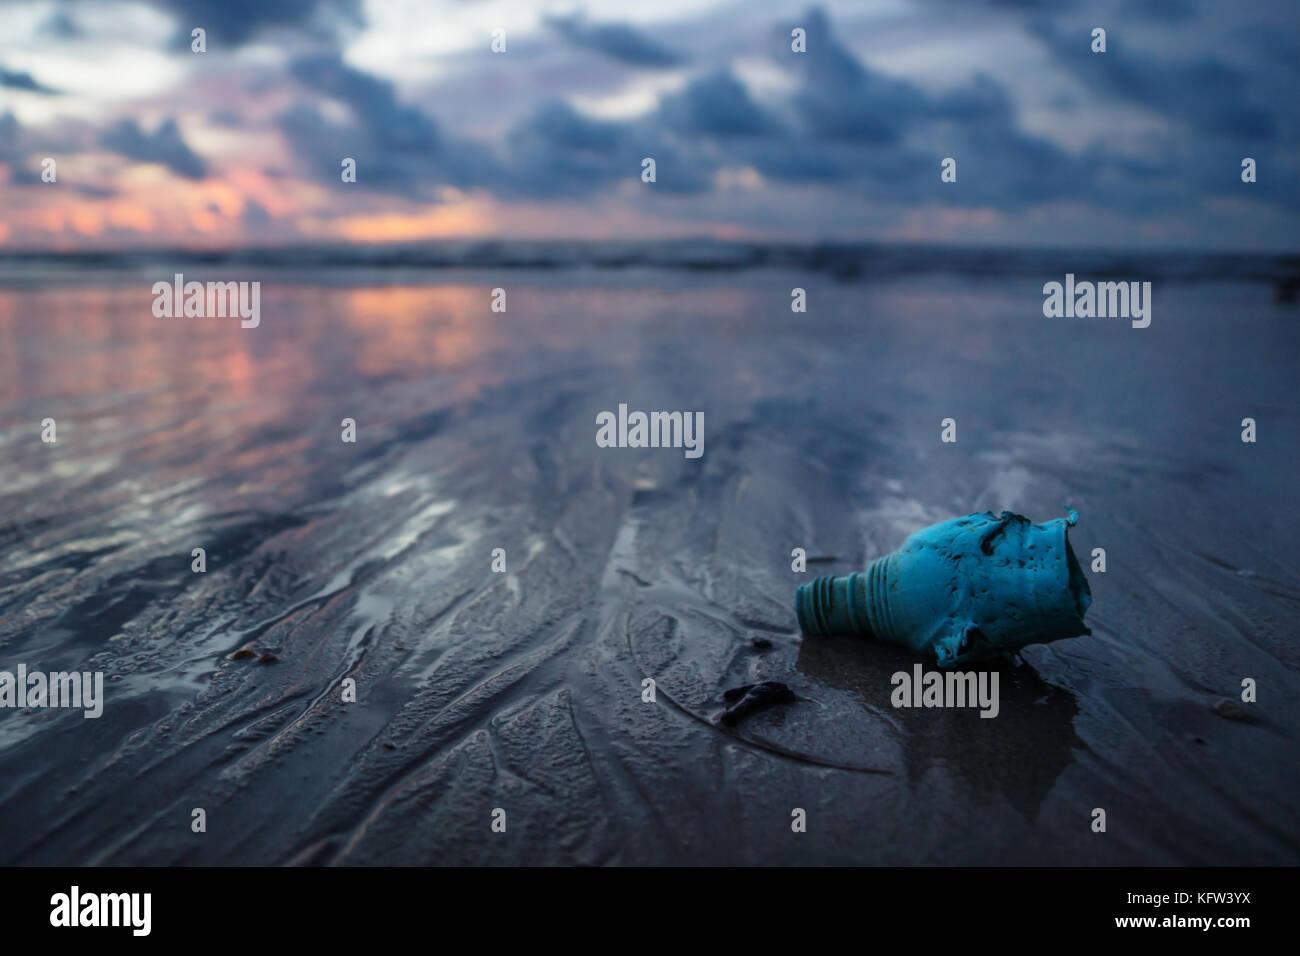 Plastic trash littering the ocean at the beach during sunset, Koh Lanta, Thailand - Stock Image